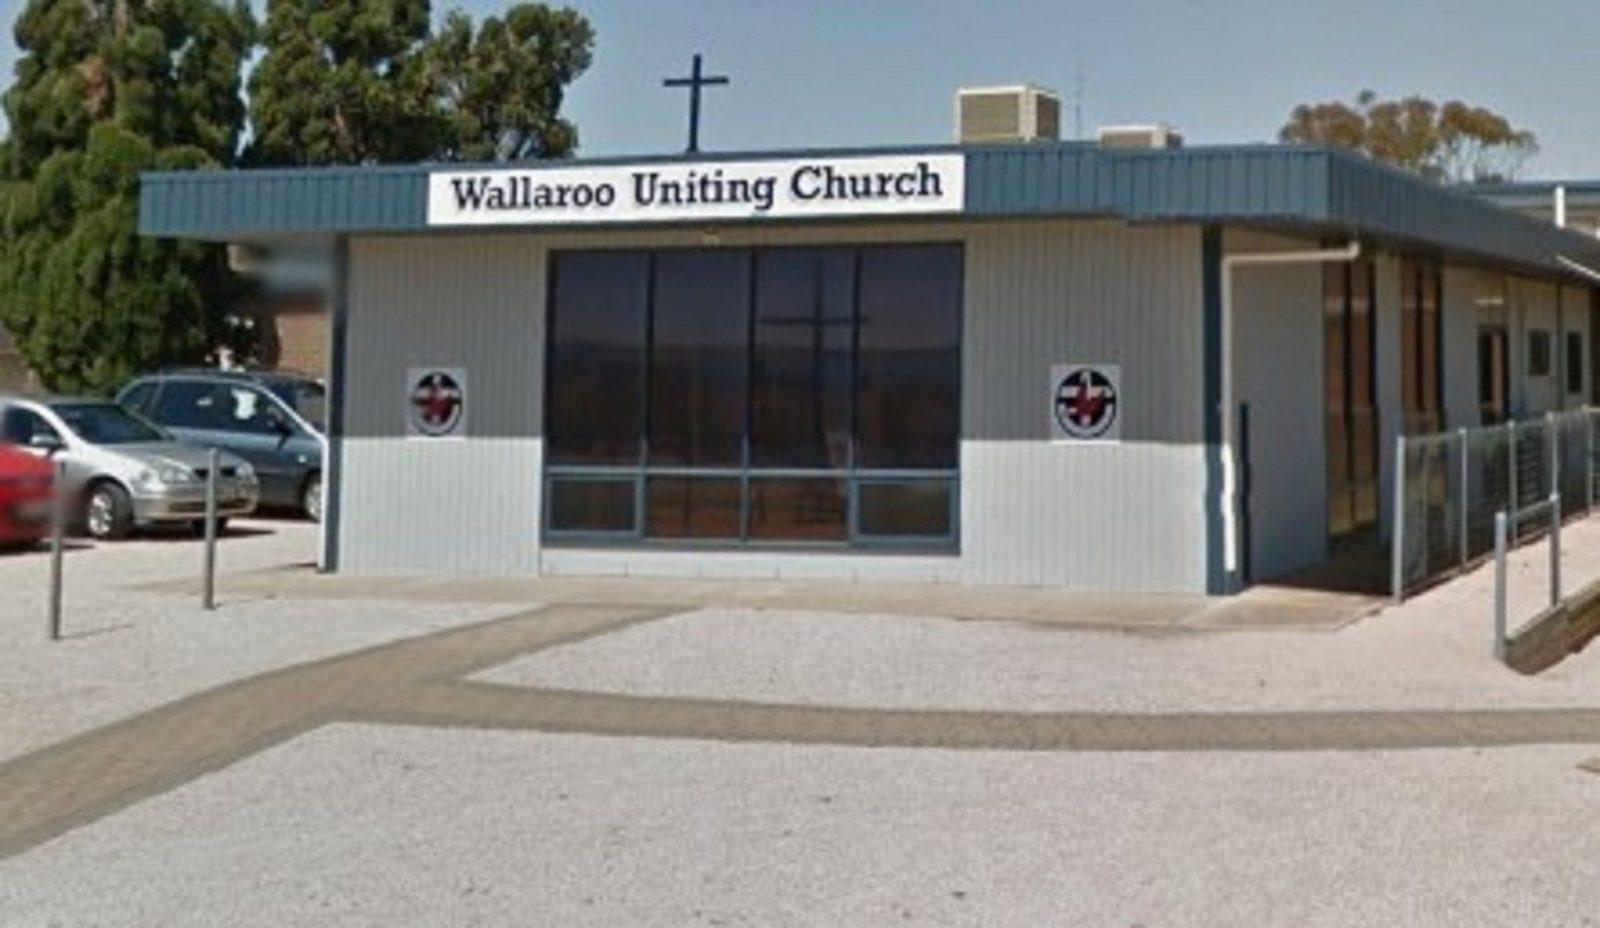 Wallaroo Uniting Church